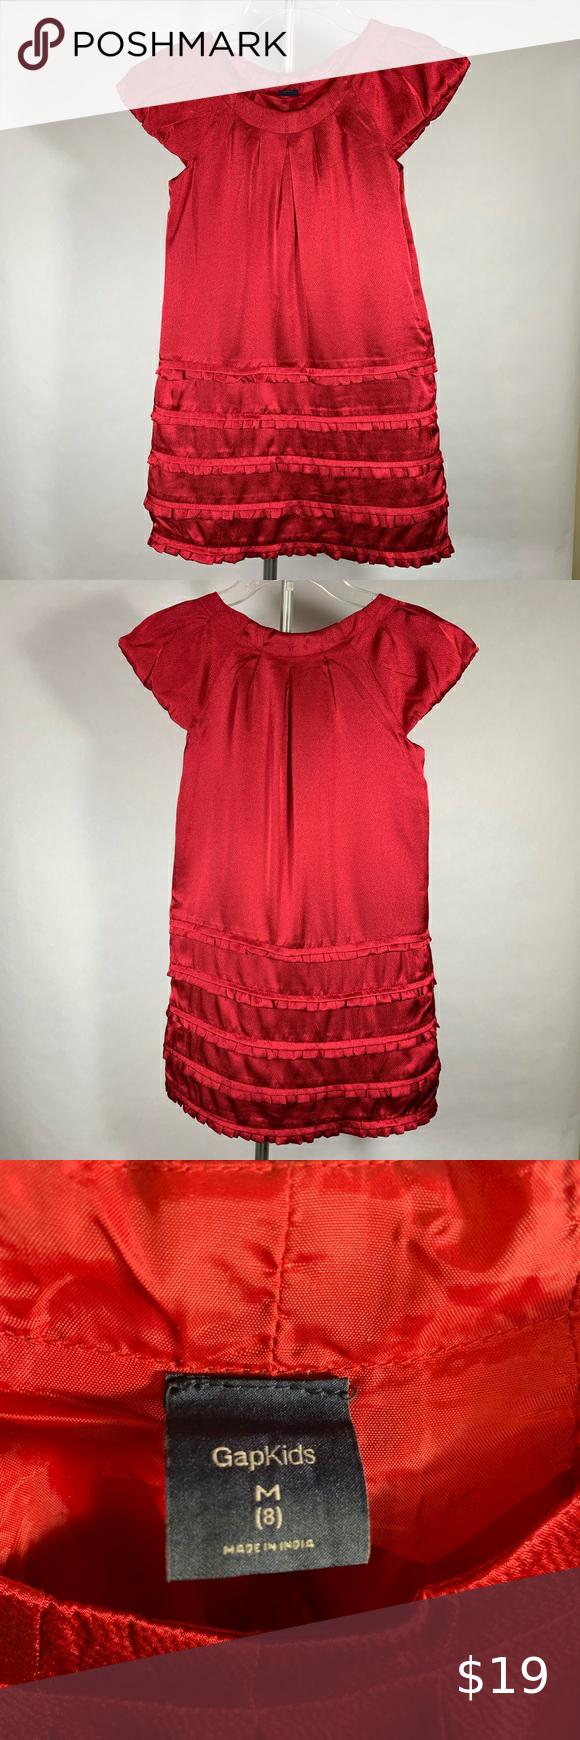 Gap Red Dress Girls Size 8 Girl Red Dress Gap Denim Dress Gap Sweater Dress [ 1740 x 580 Pixel ]